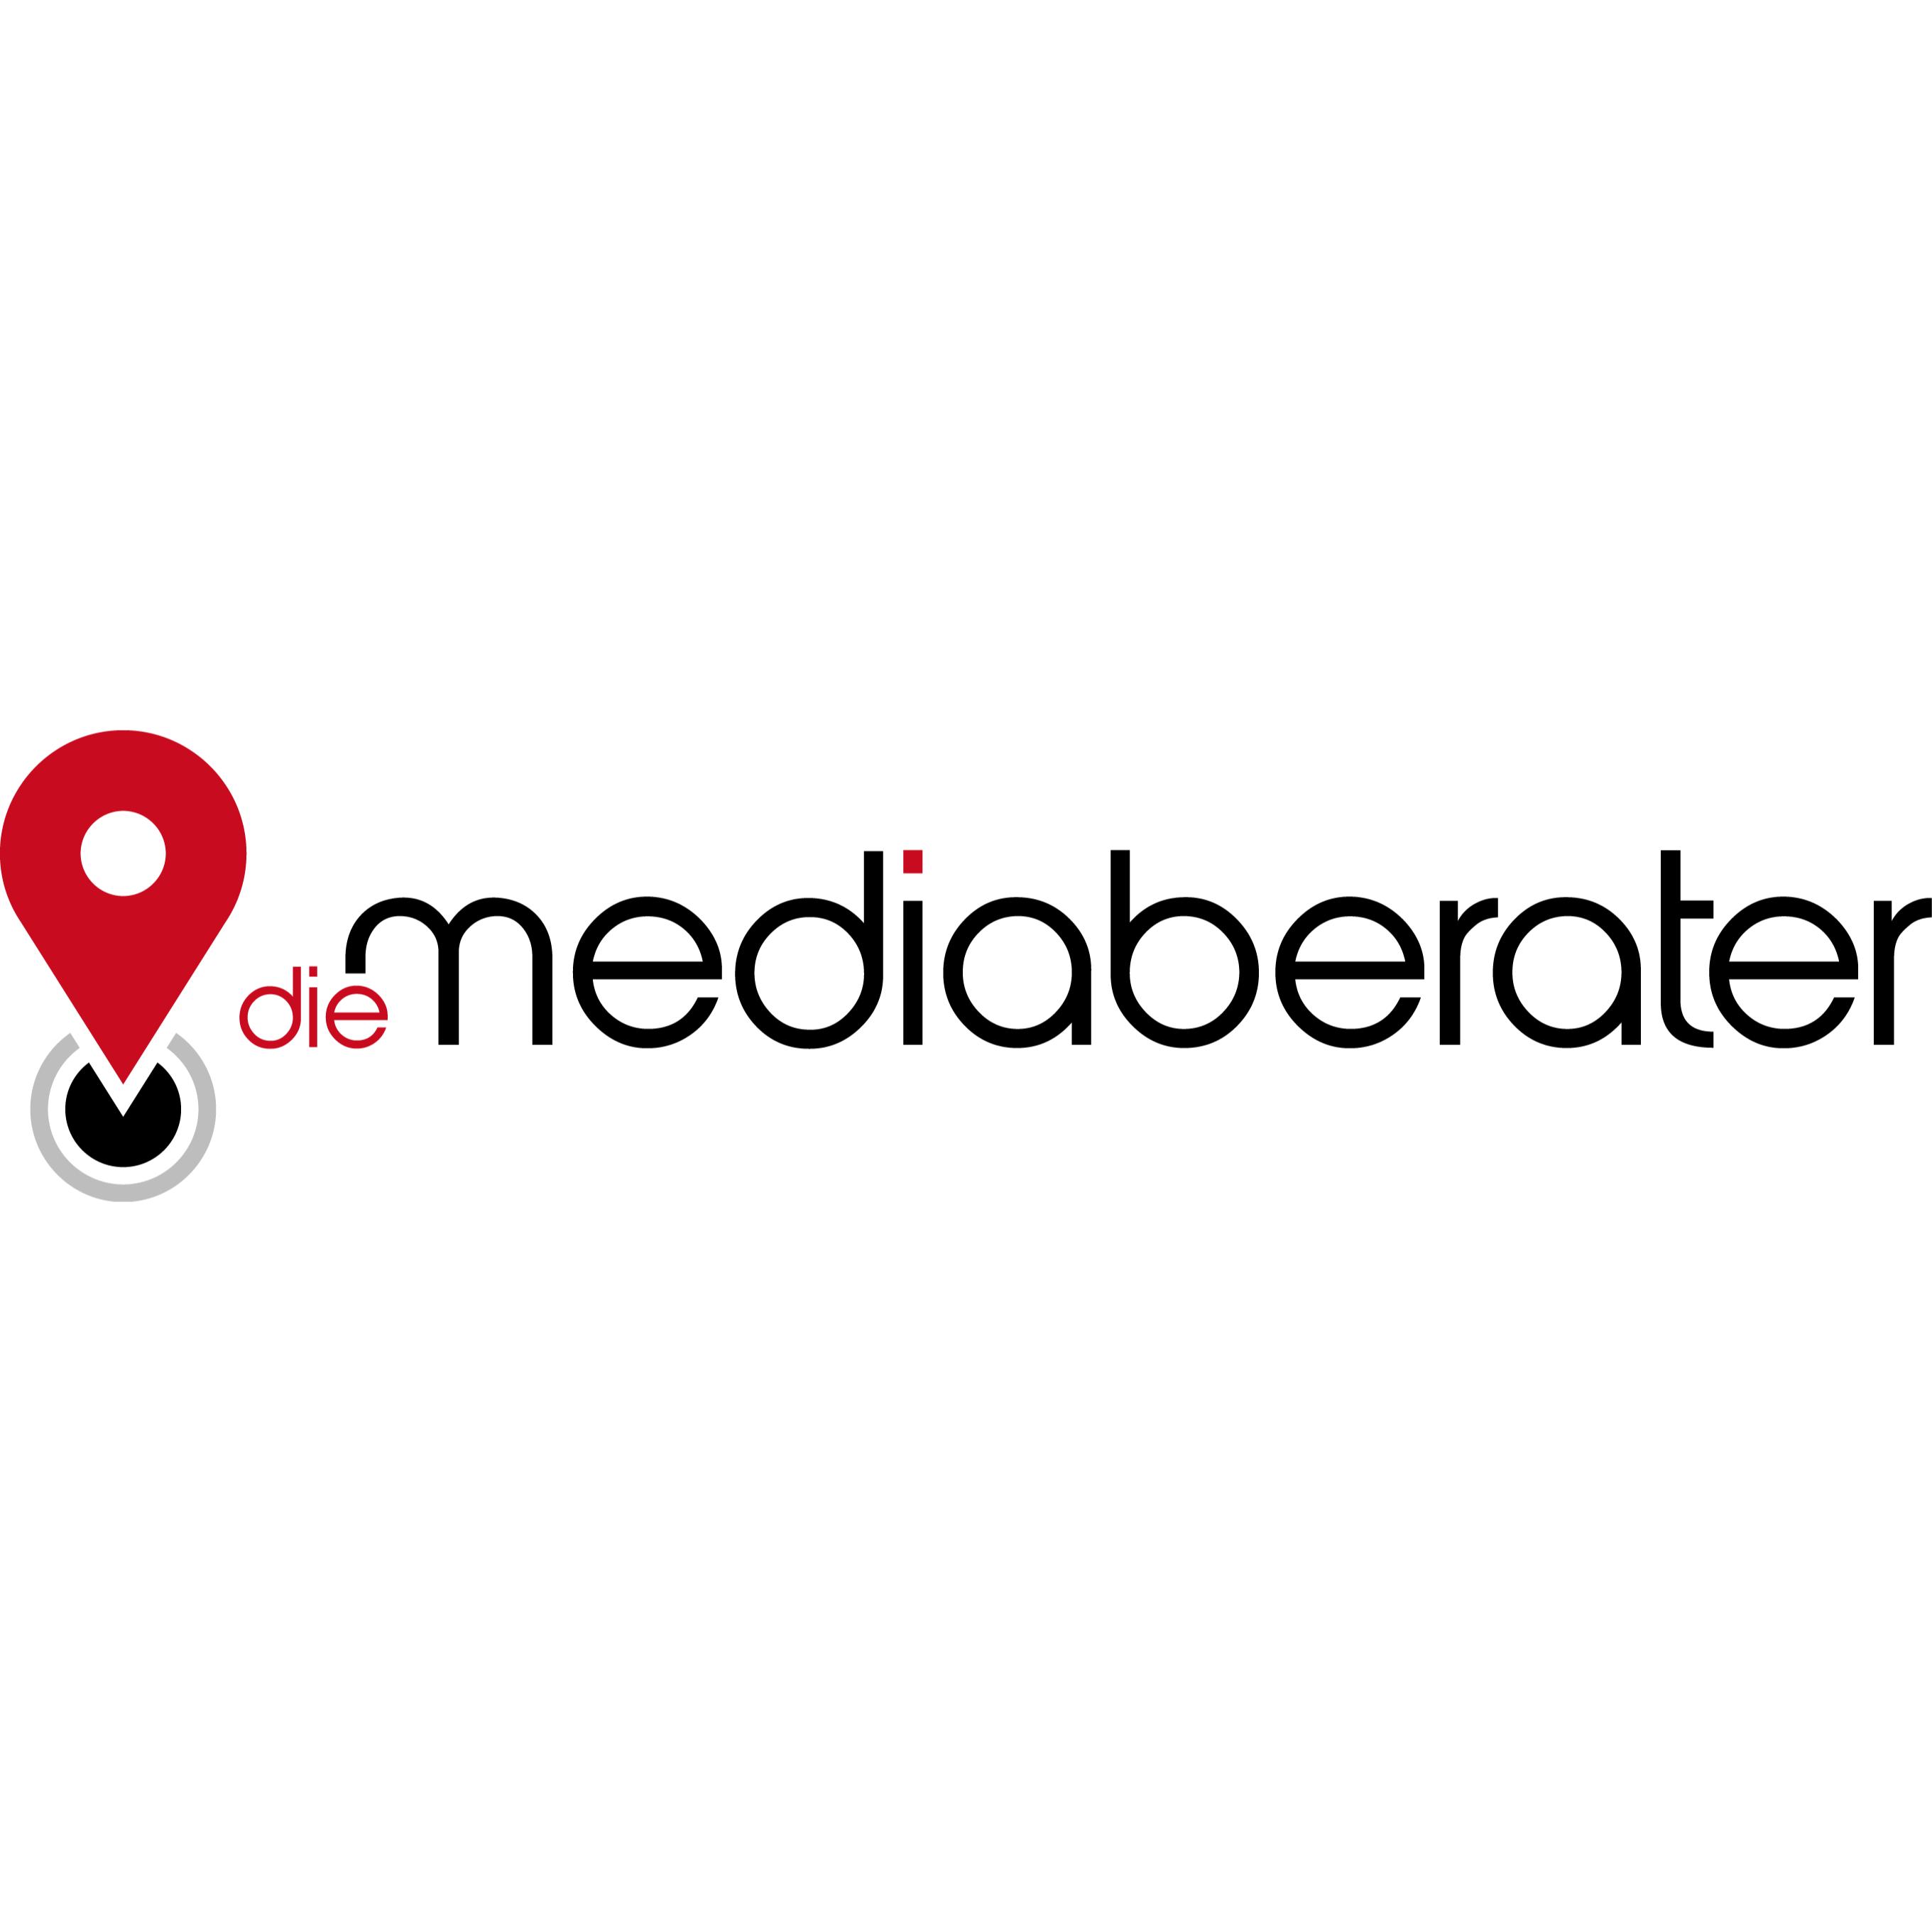 Bild zu Local SEO Nürnberg - die mediaberater in Nürnberg